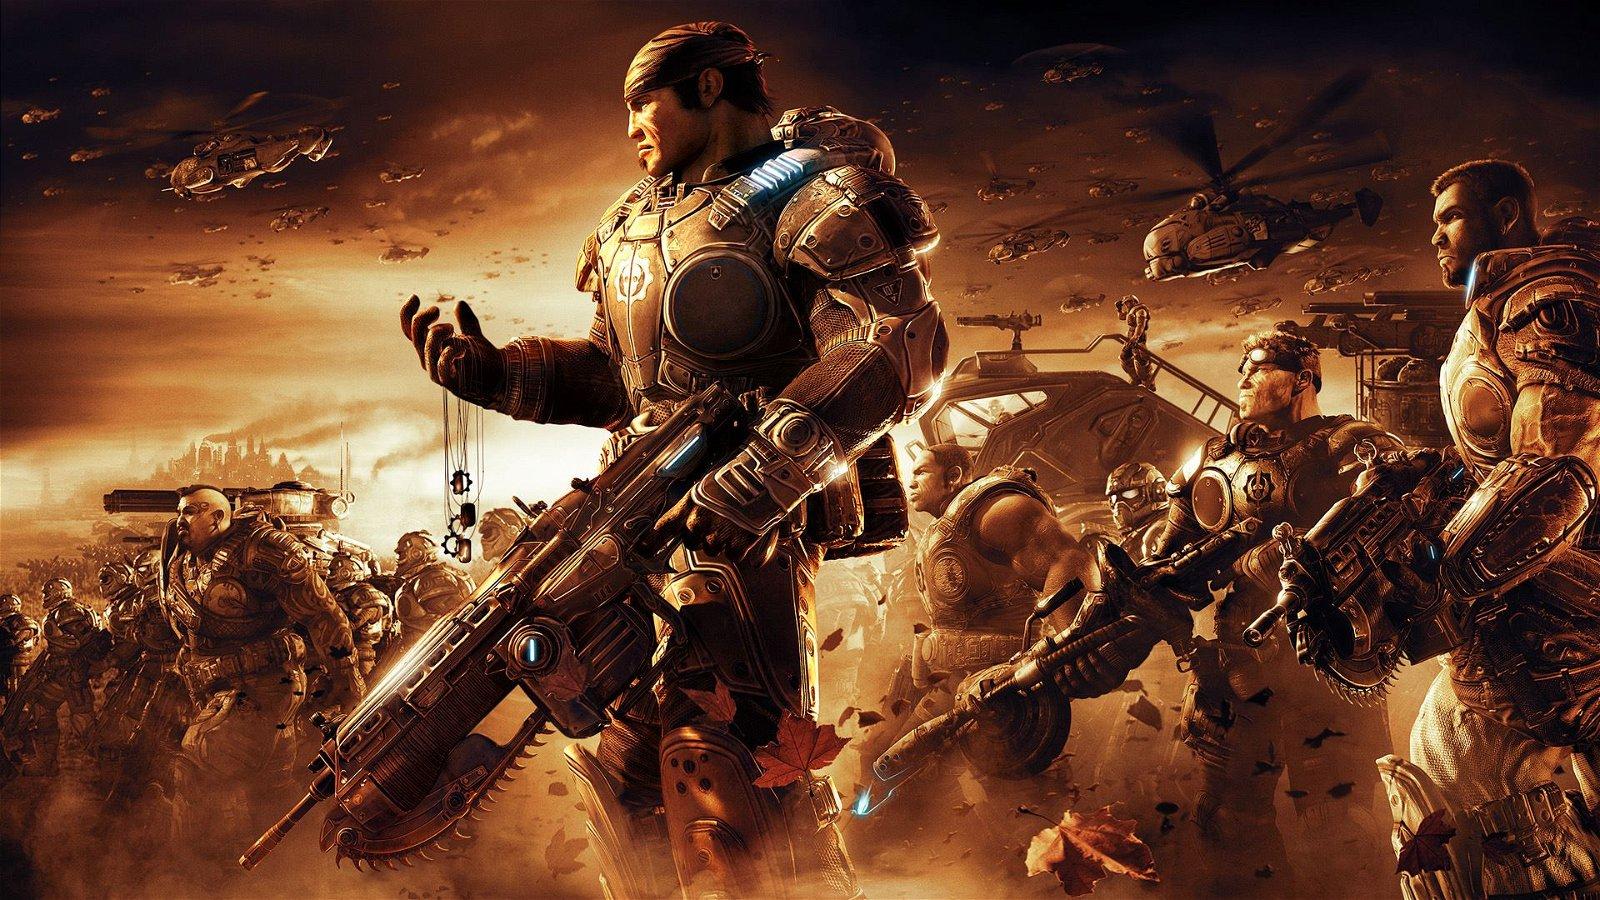 Universal Developing Gears of War Movie